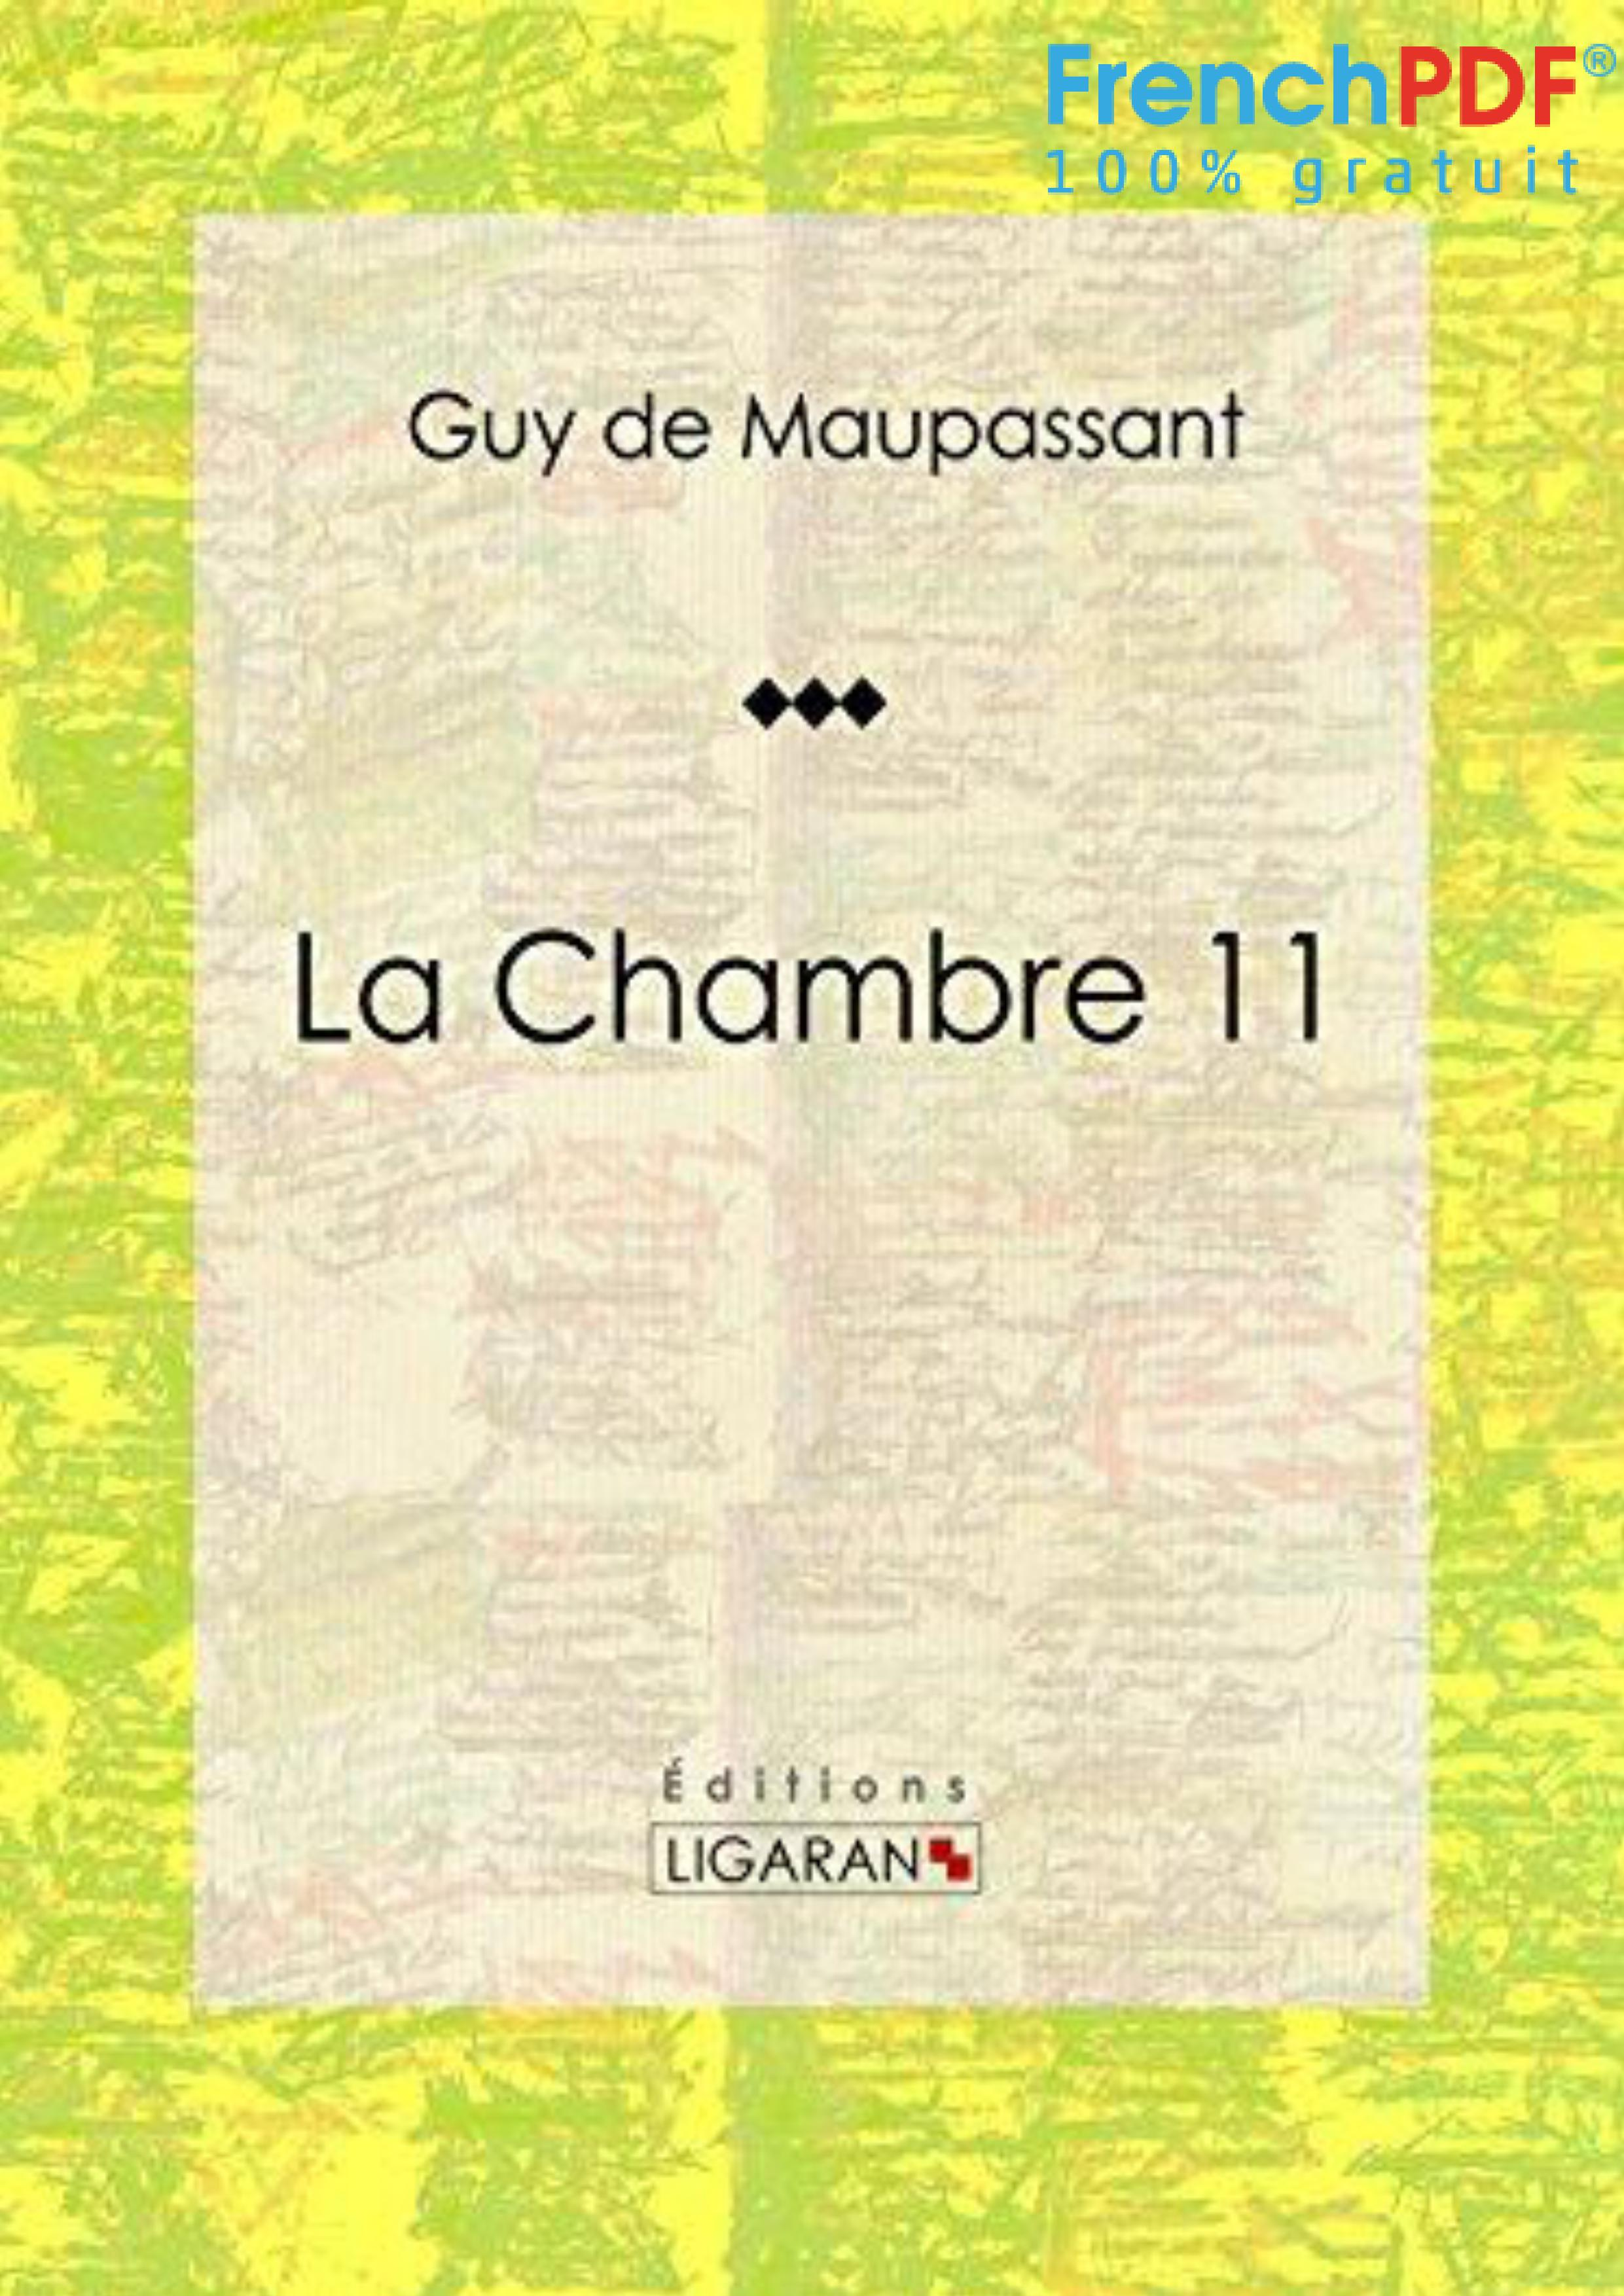 La Chambre 11 - Maupassant - FrenchPDF.com